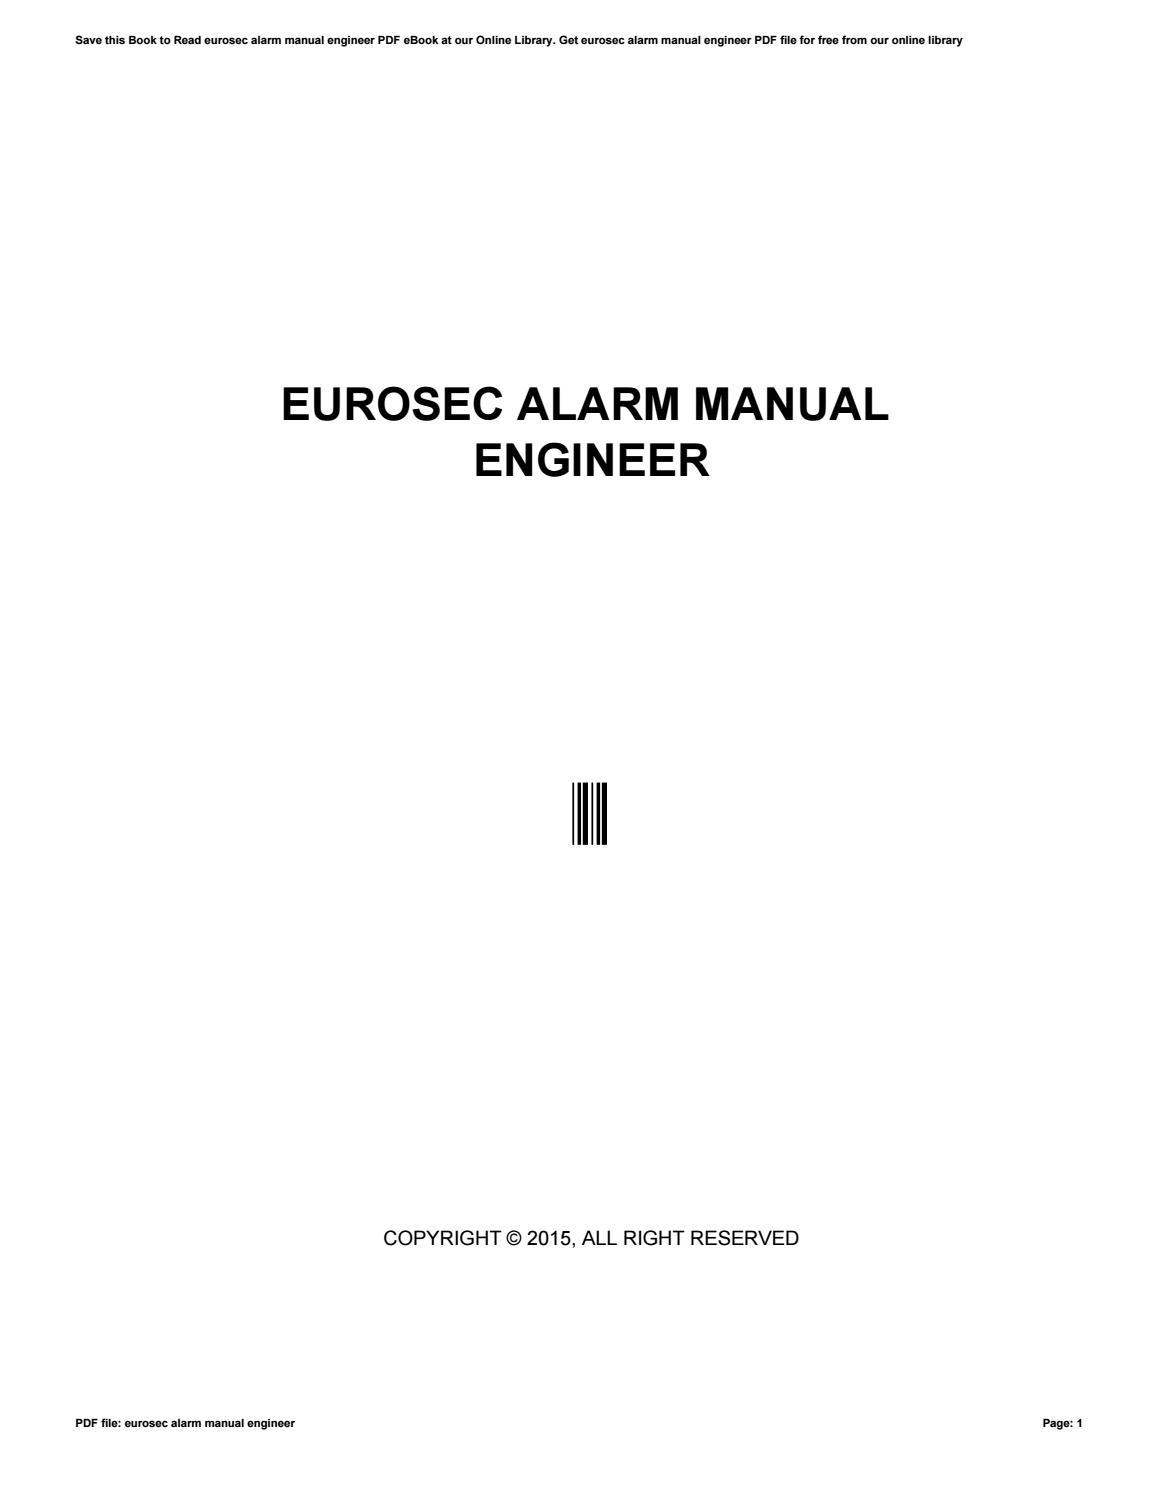 Yamaha vx11 repair manual ebook array alarm installation manual ebook rh alarm installation manual ebook argodata us fandeluxe Choice Image